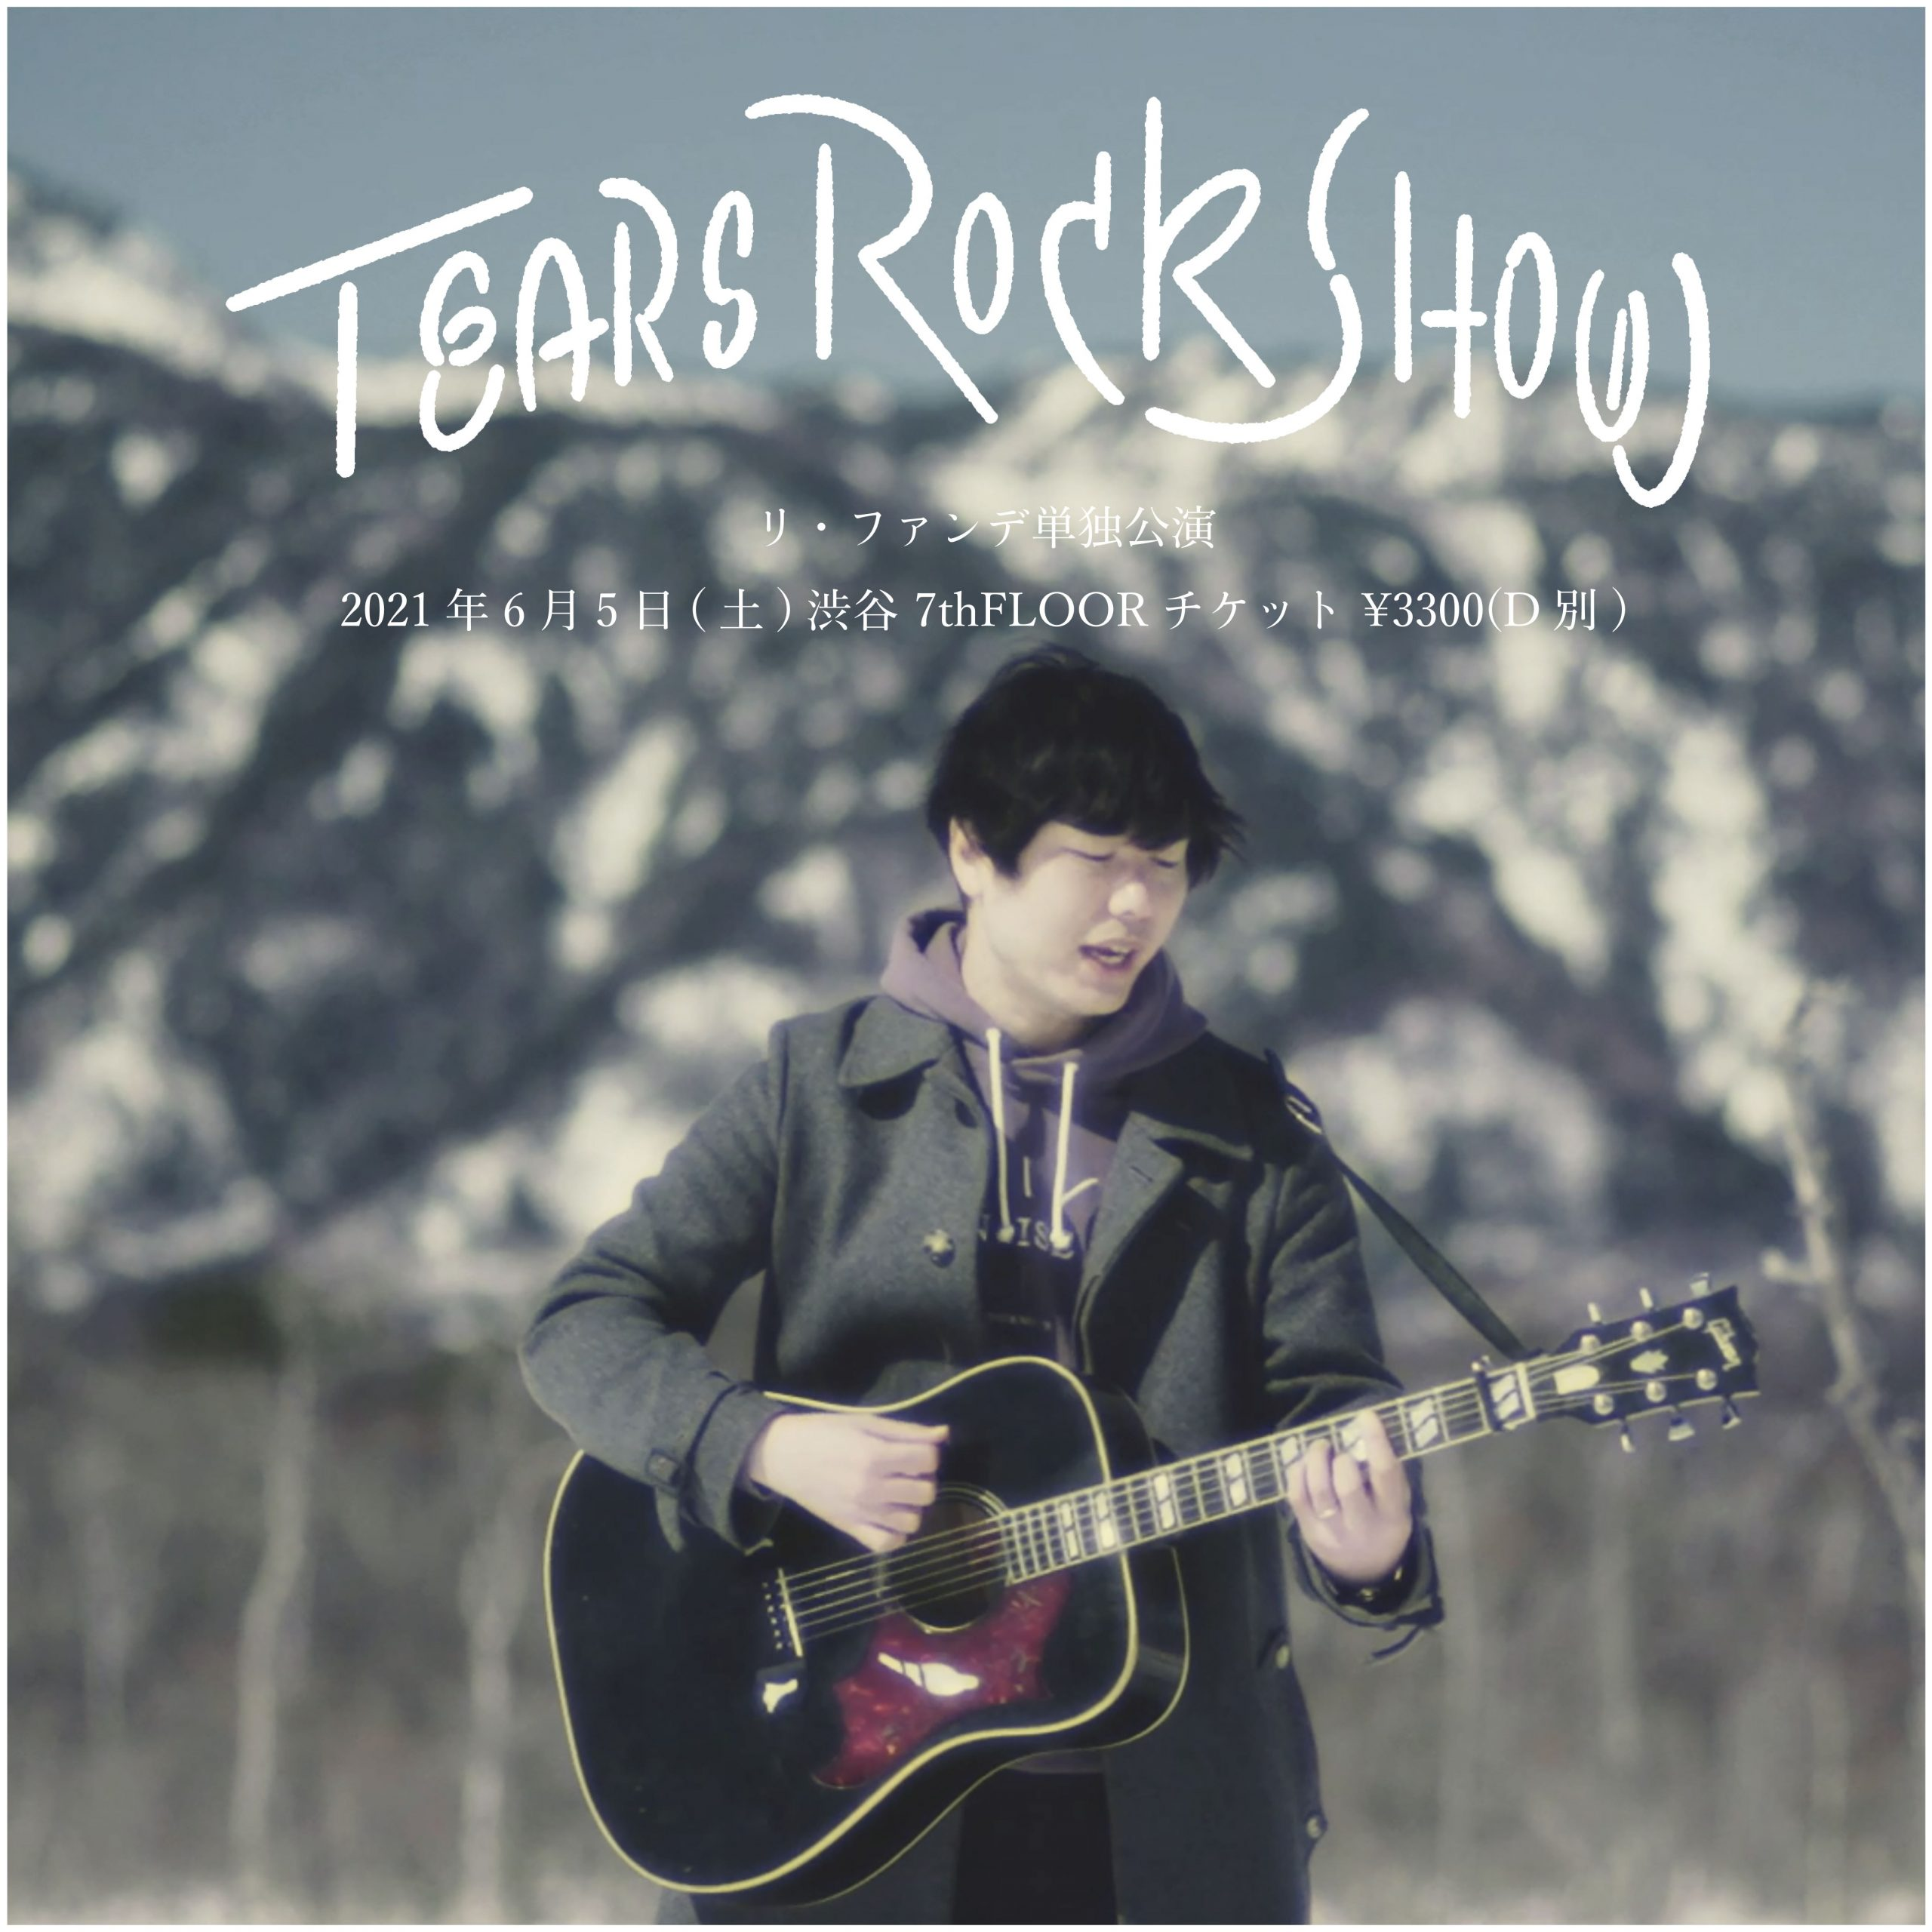 「Tears Rock Show」単独公演